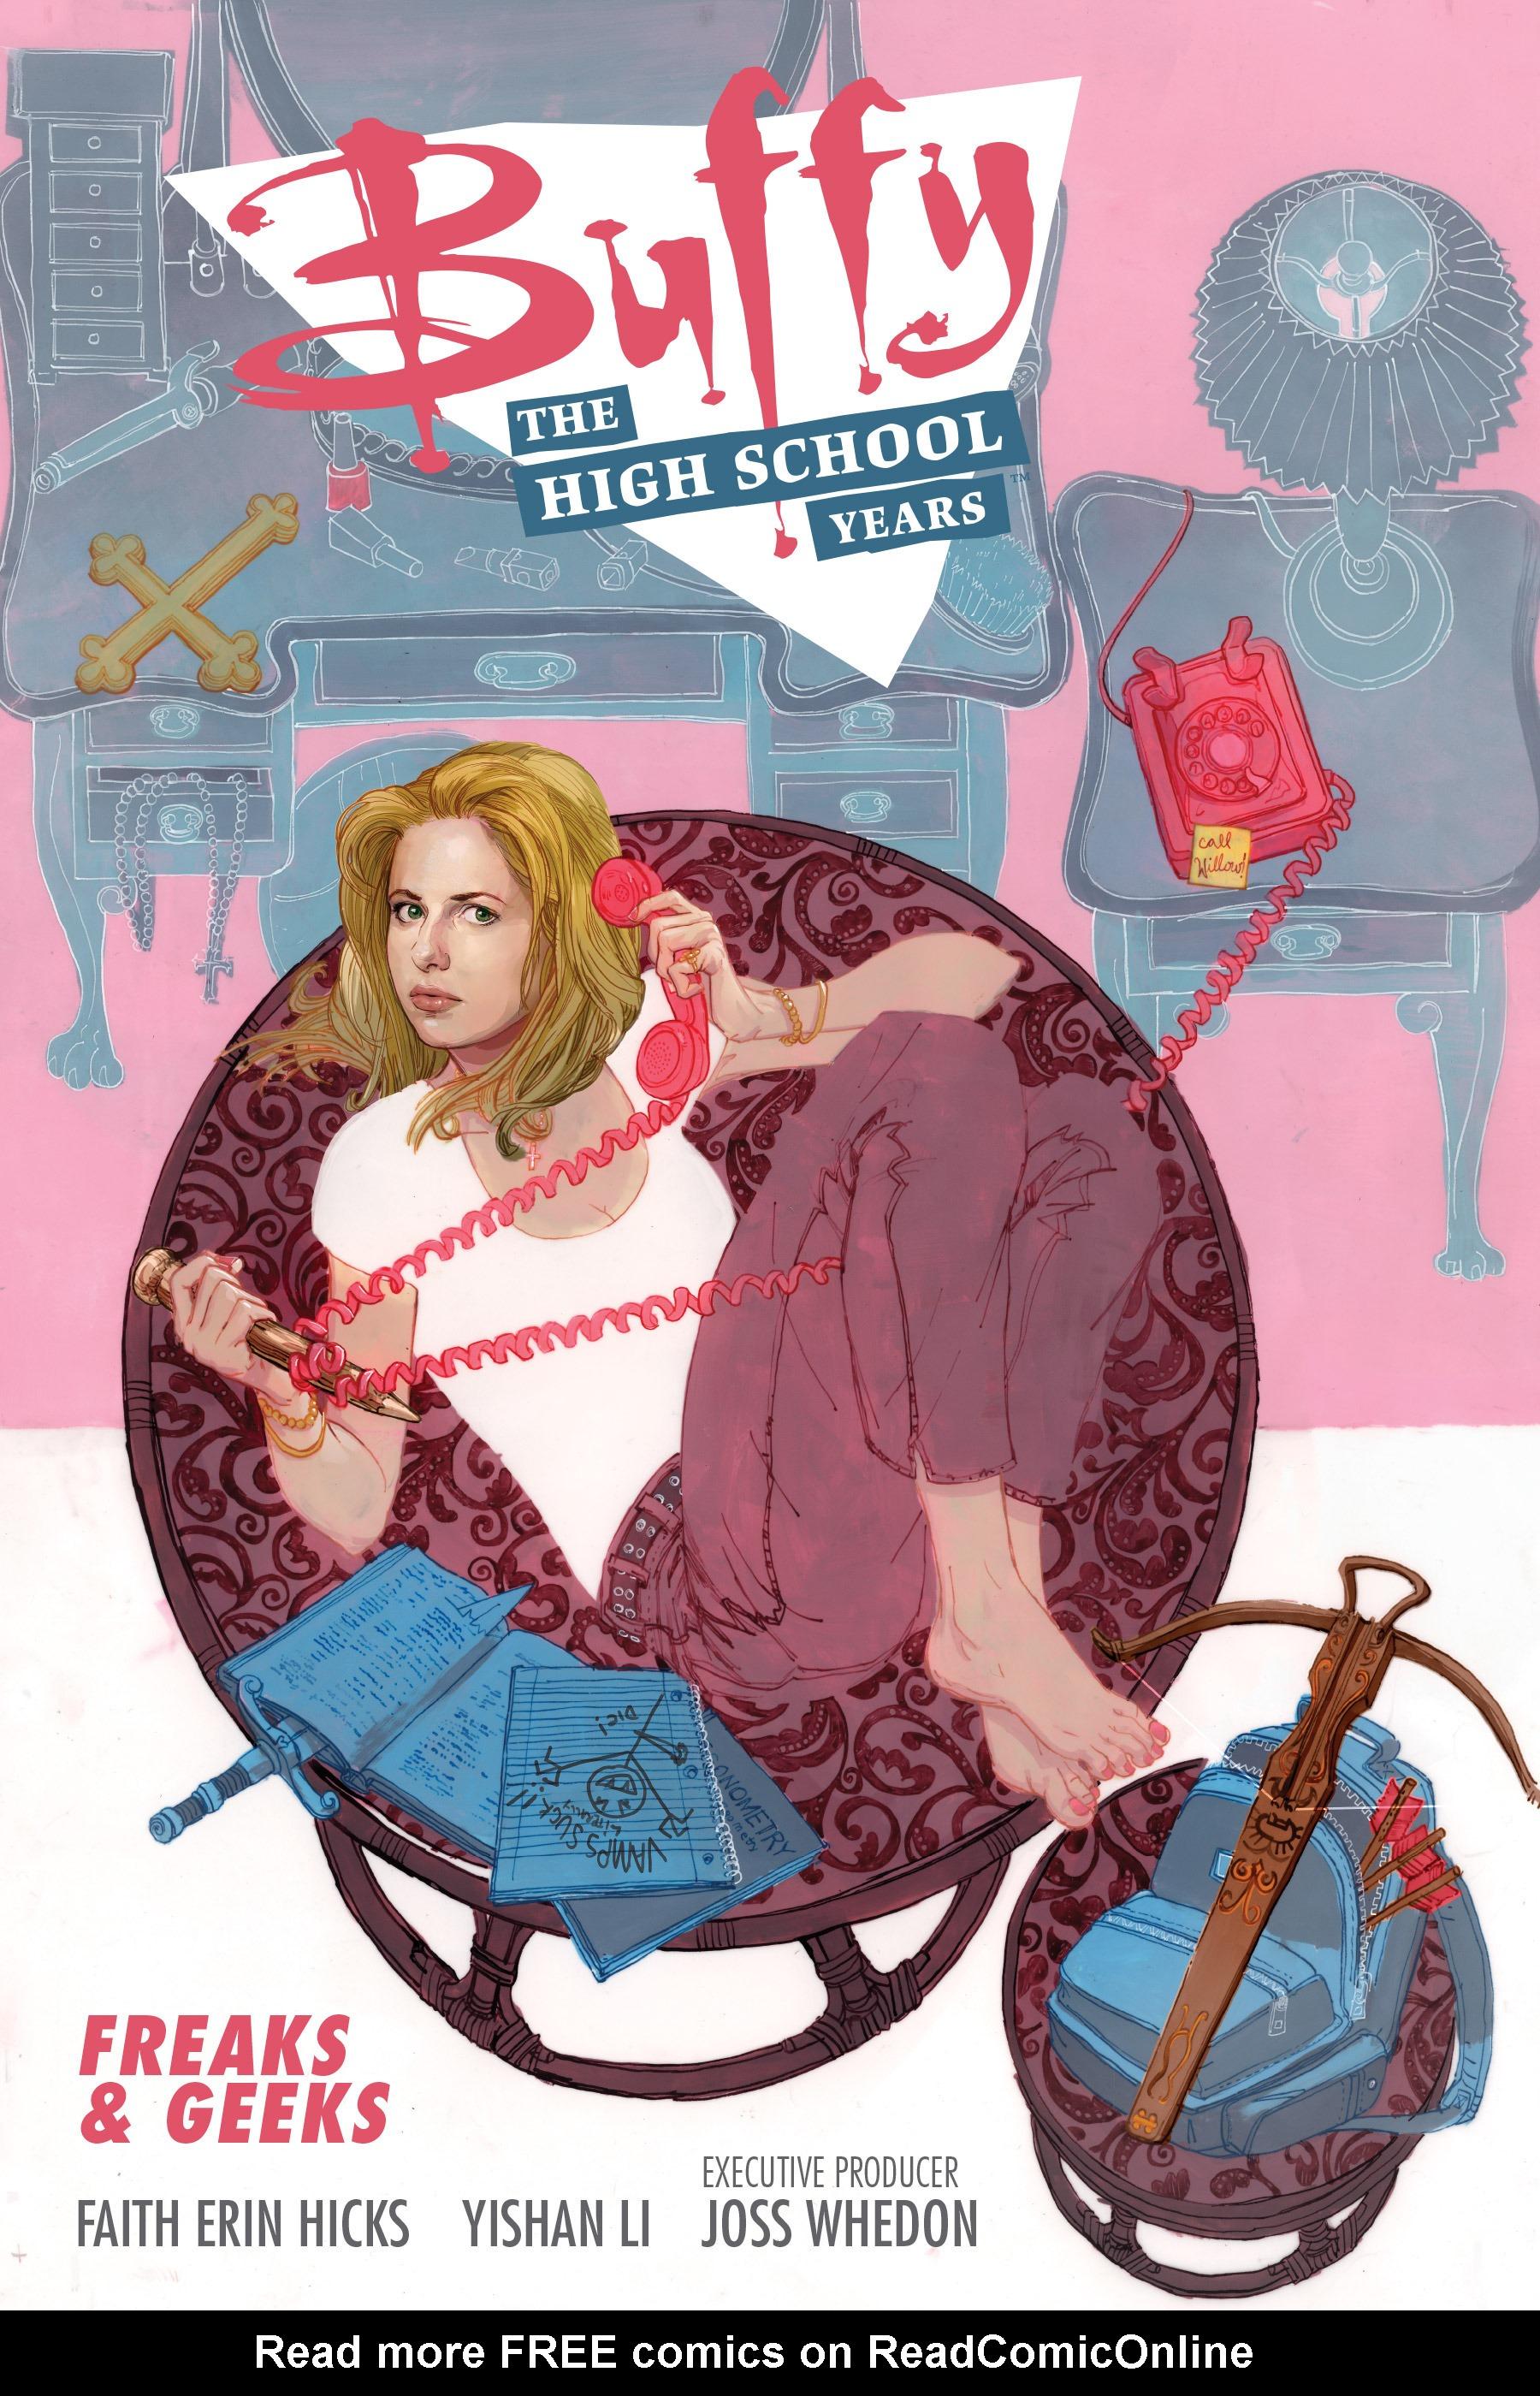 Buffy: The High School Years - Freaks & Geeks Full Page 1